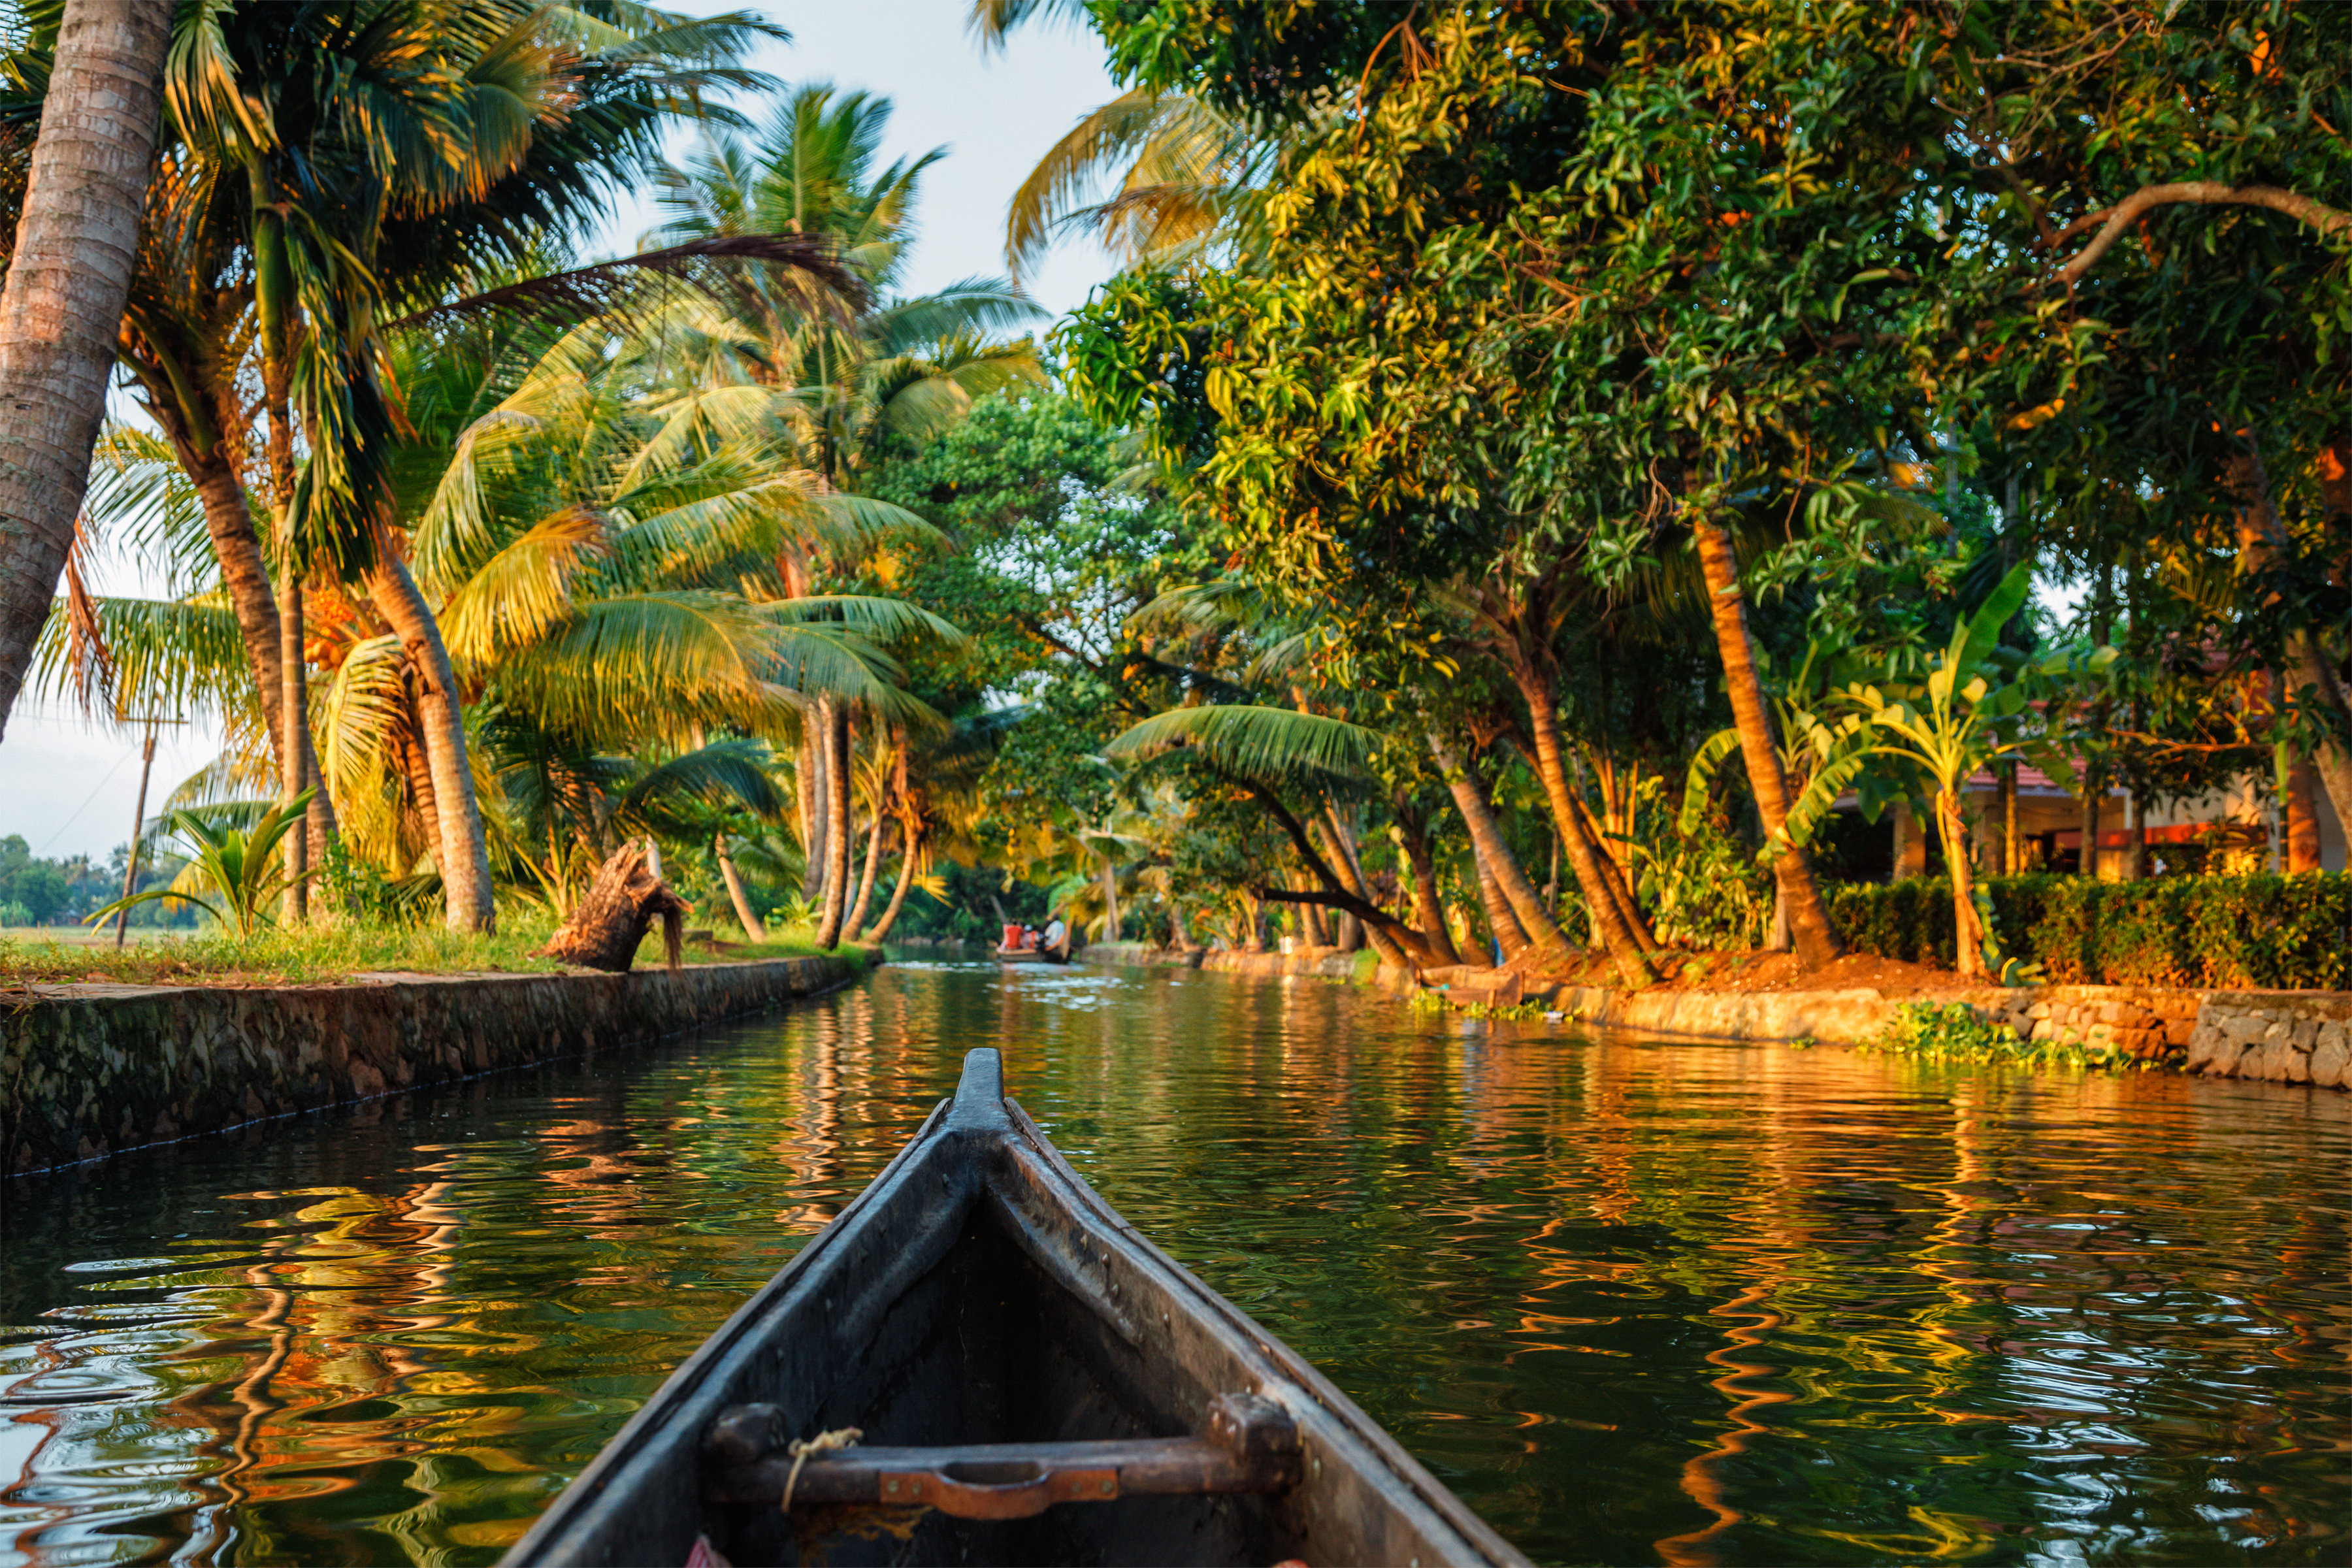 backwaters of kerala in india